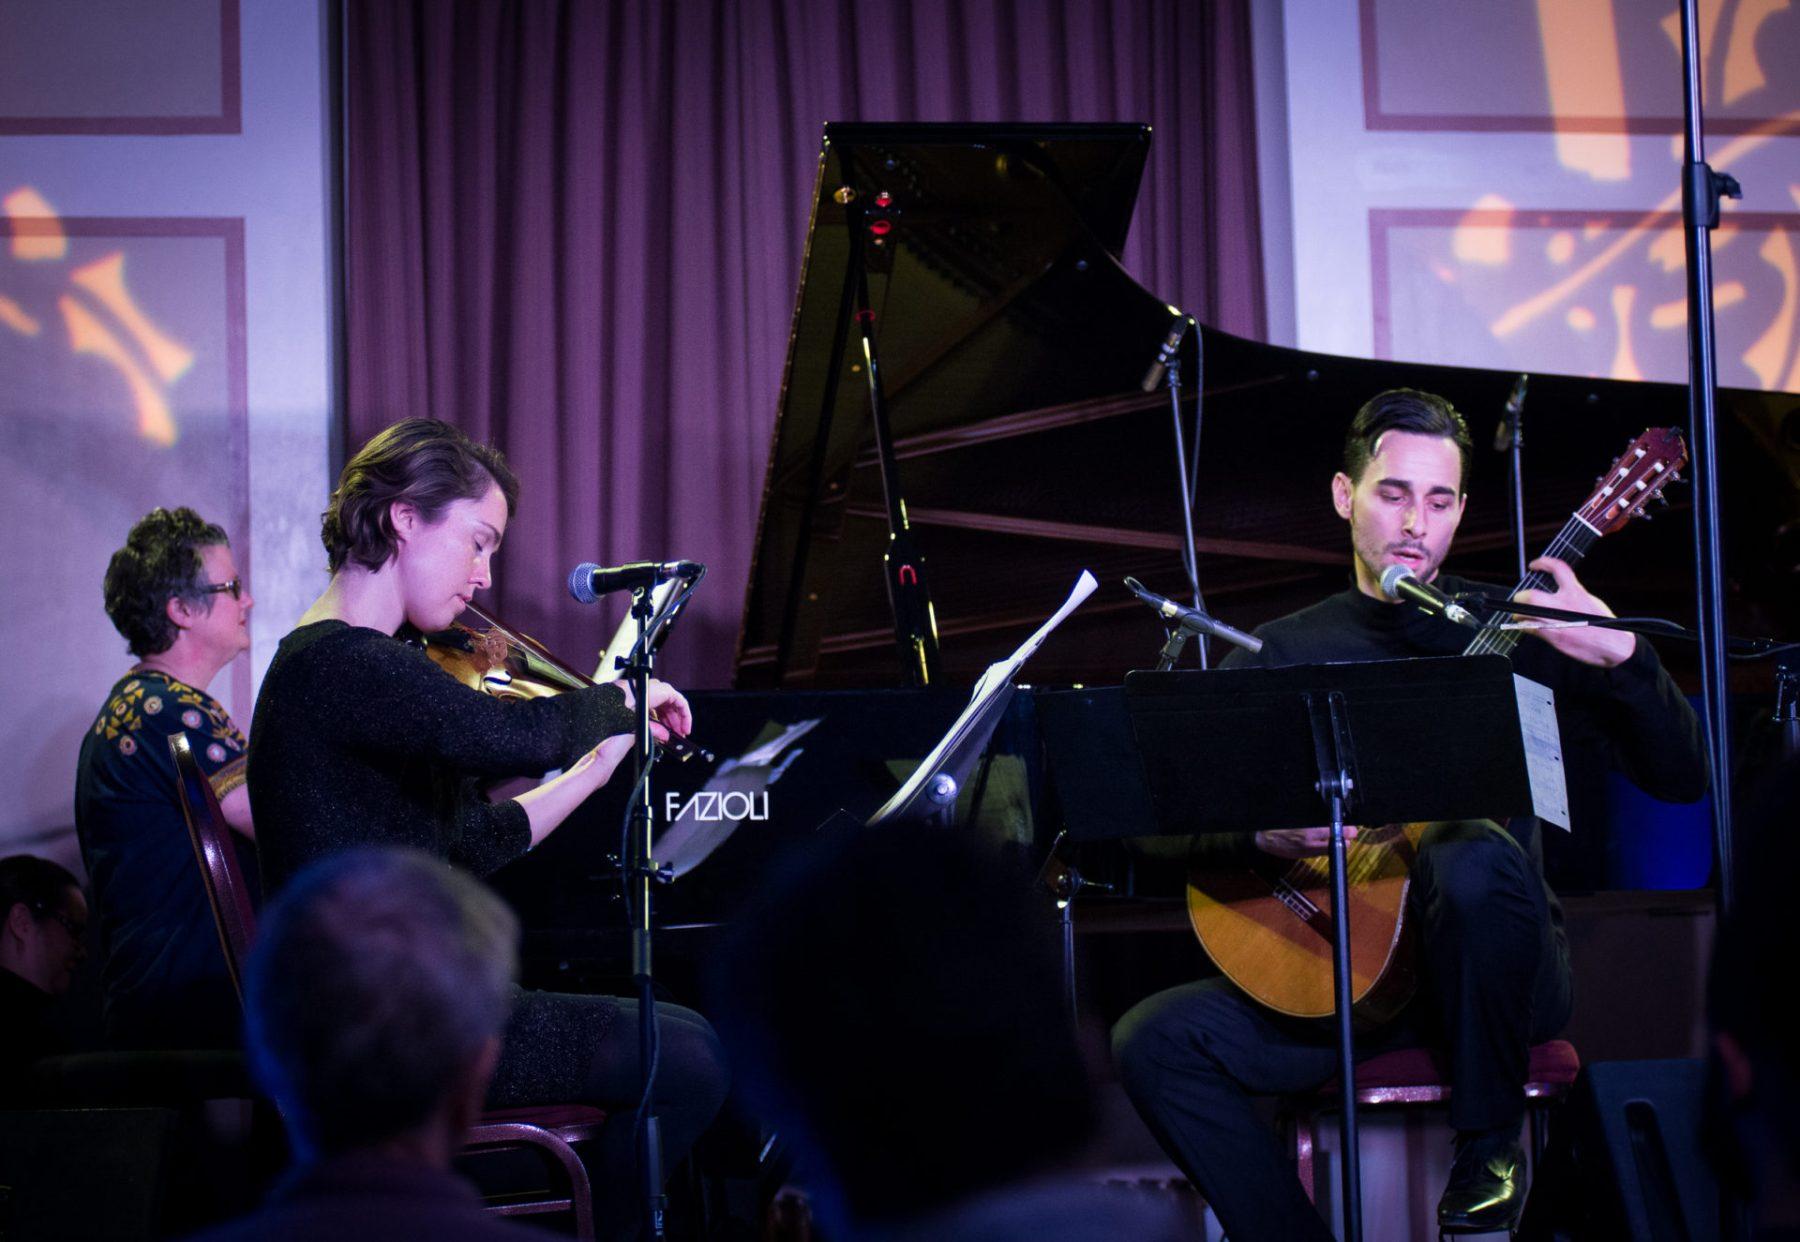 Veda Hille, Caroline Shaw & Adrian Verdejo, Music for the Winter Solstice 2016